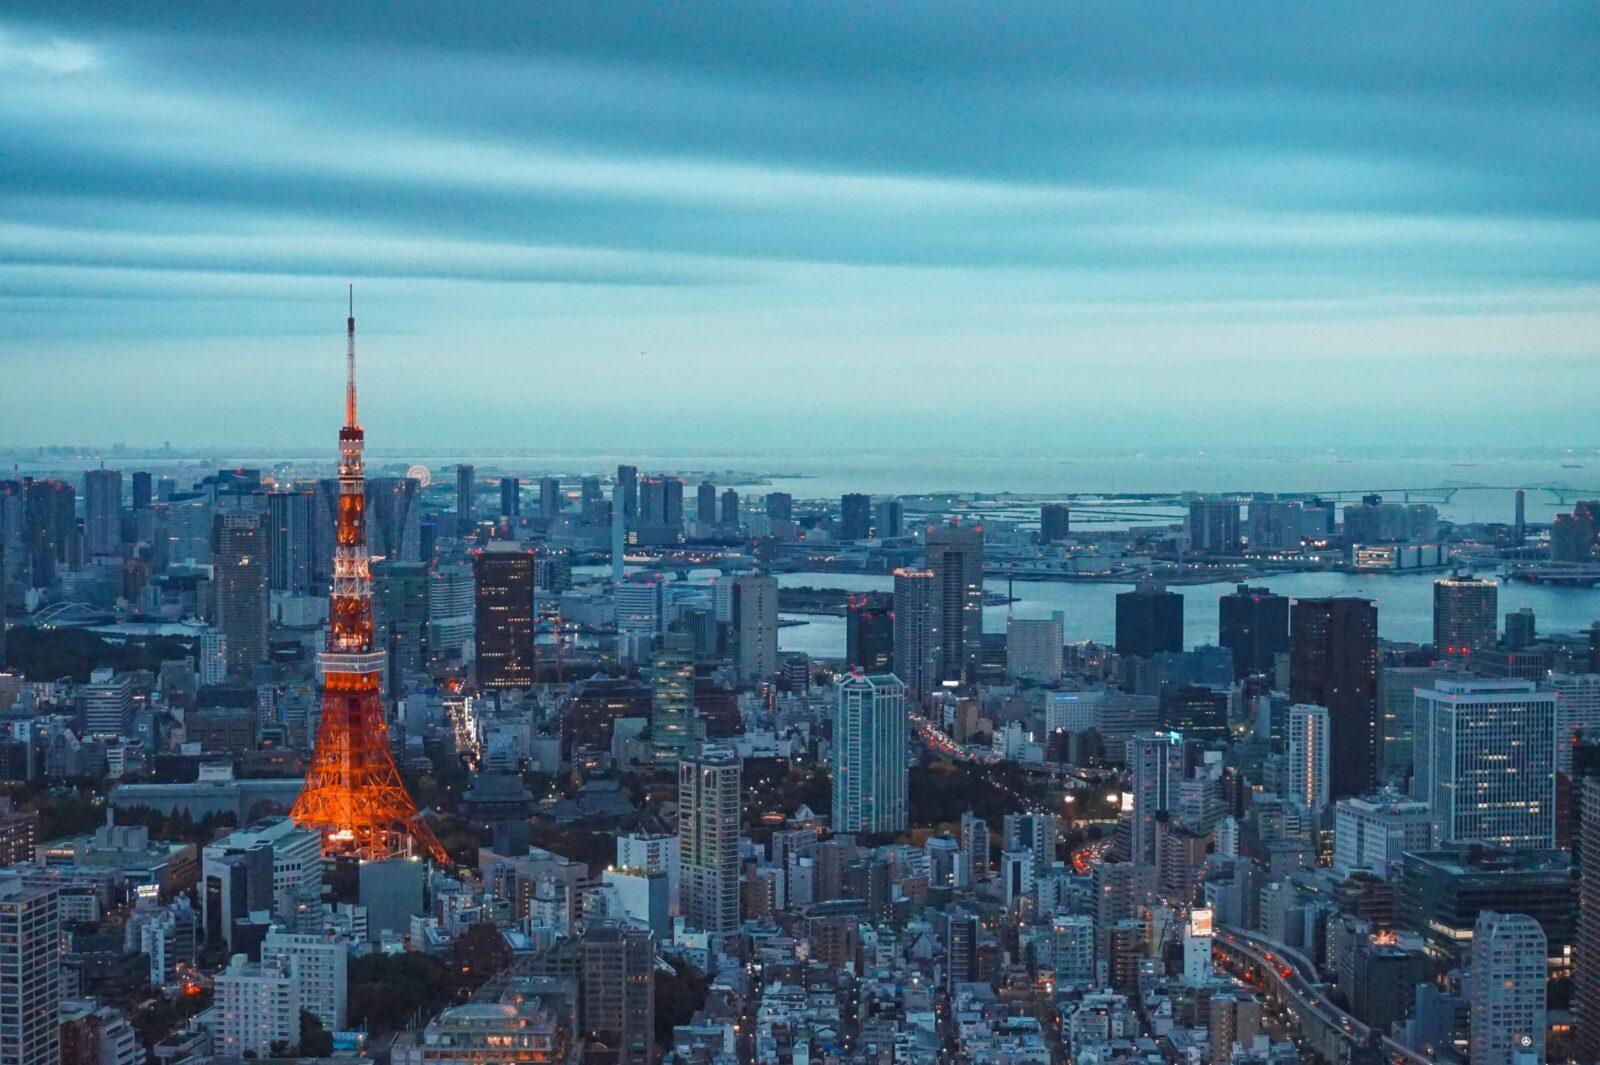 louie martinez iocjwyqrv3m unsplash scaled - Tokyo: a city of innovation